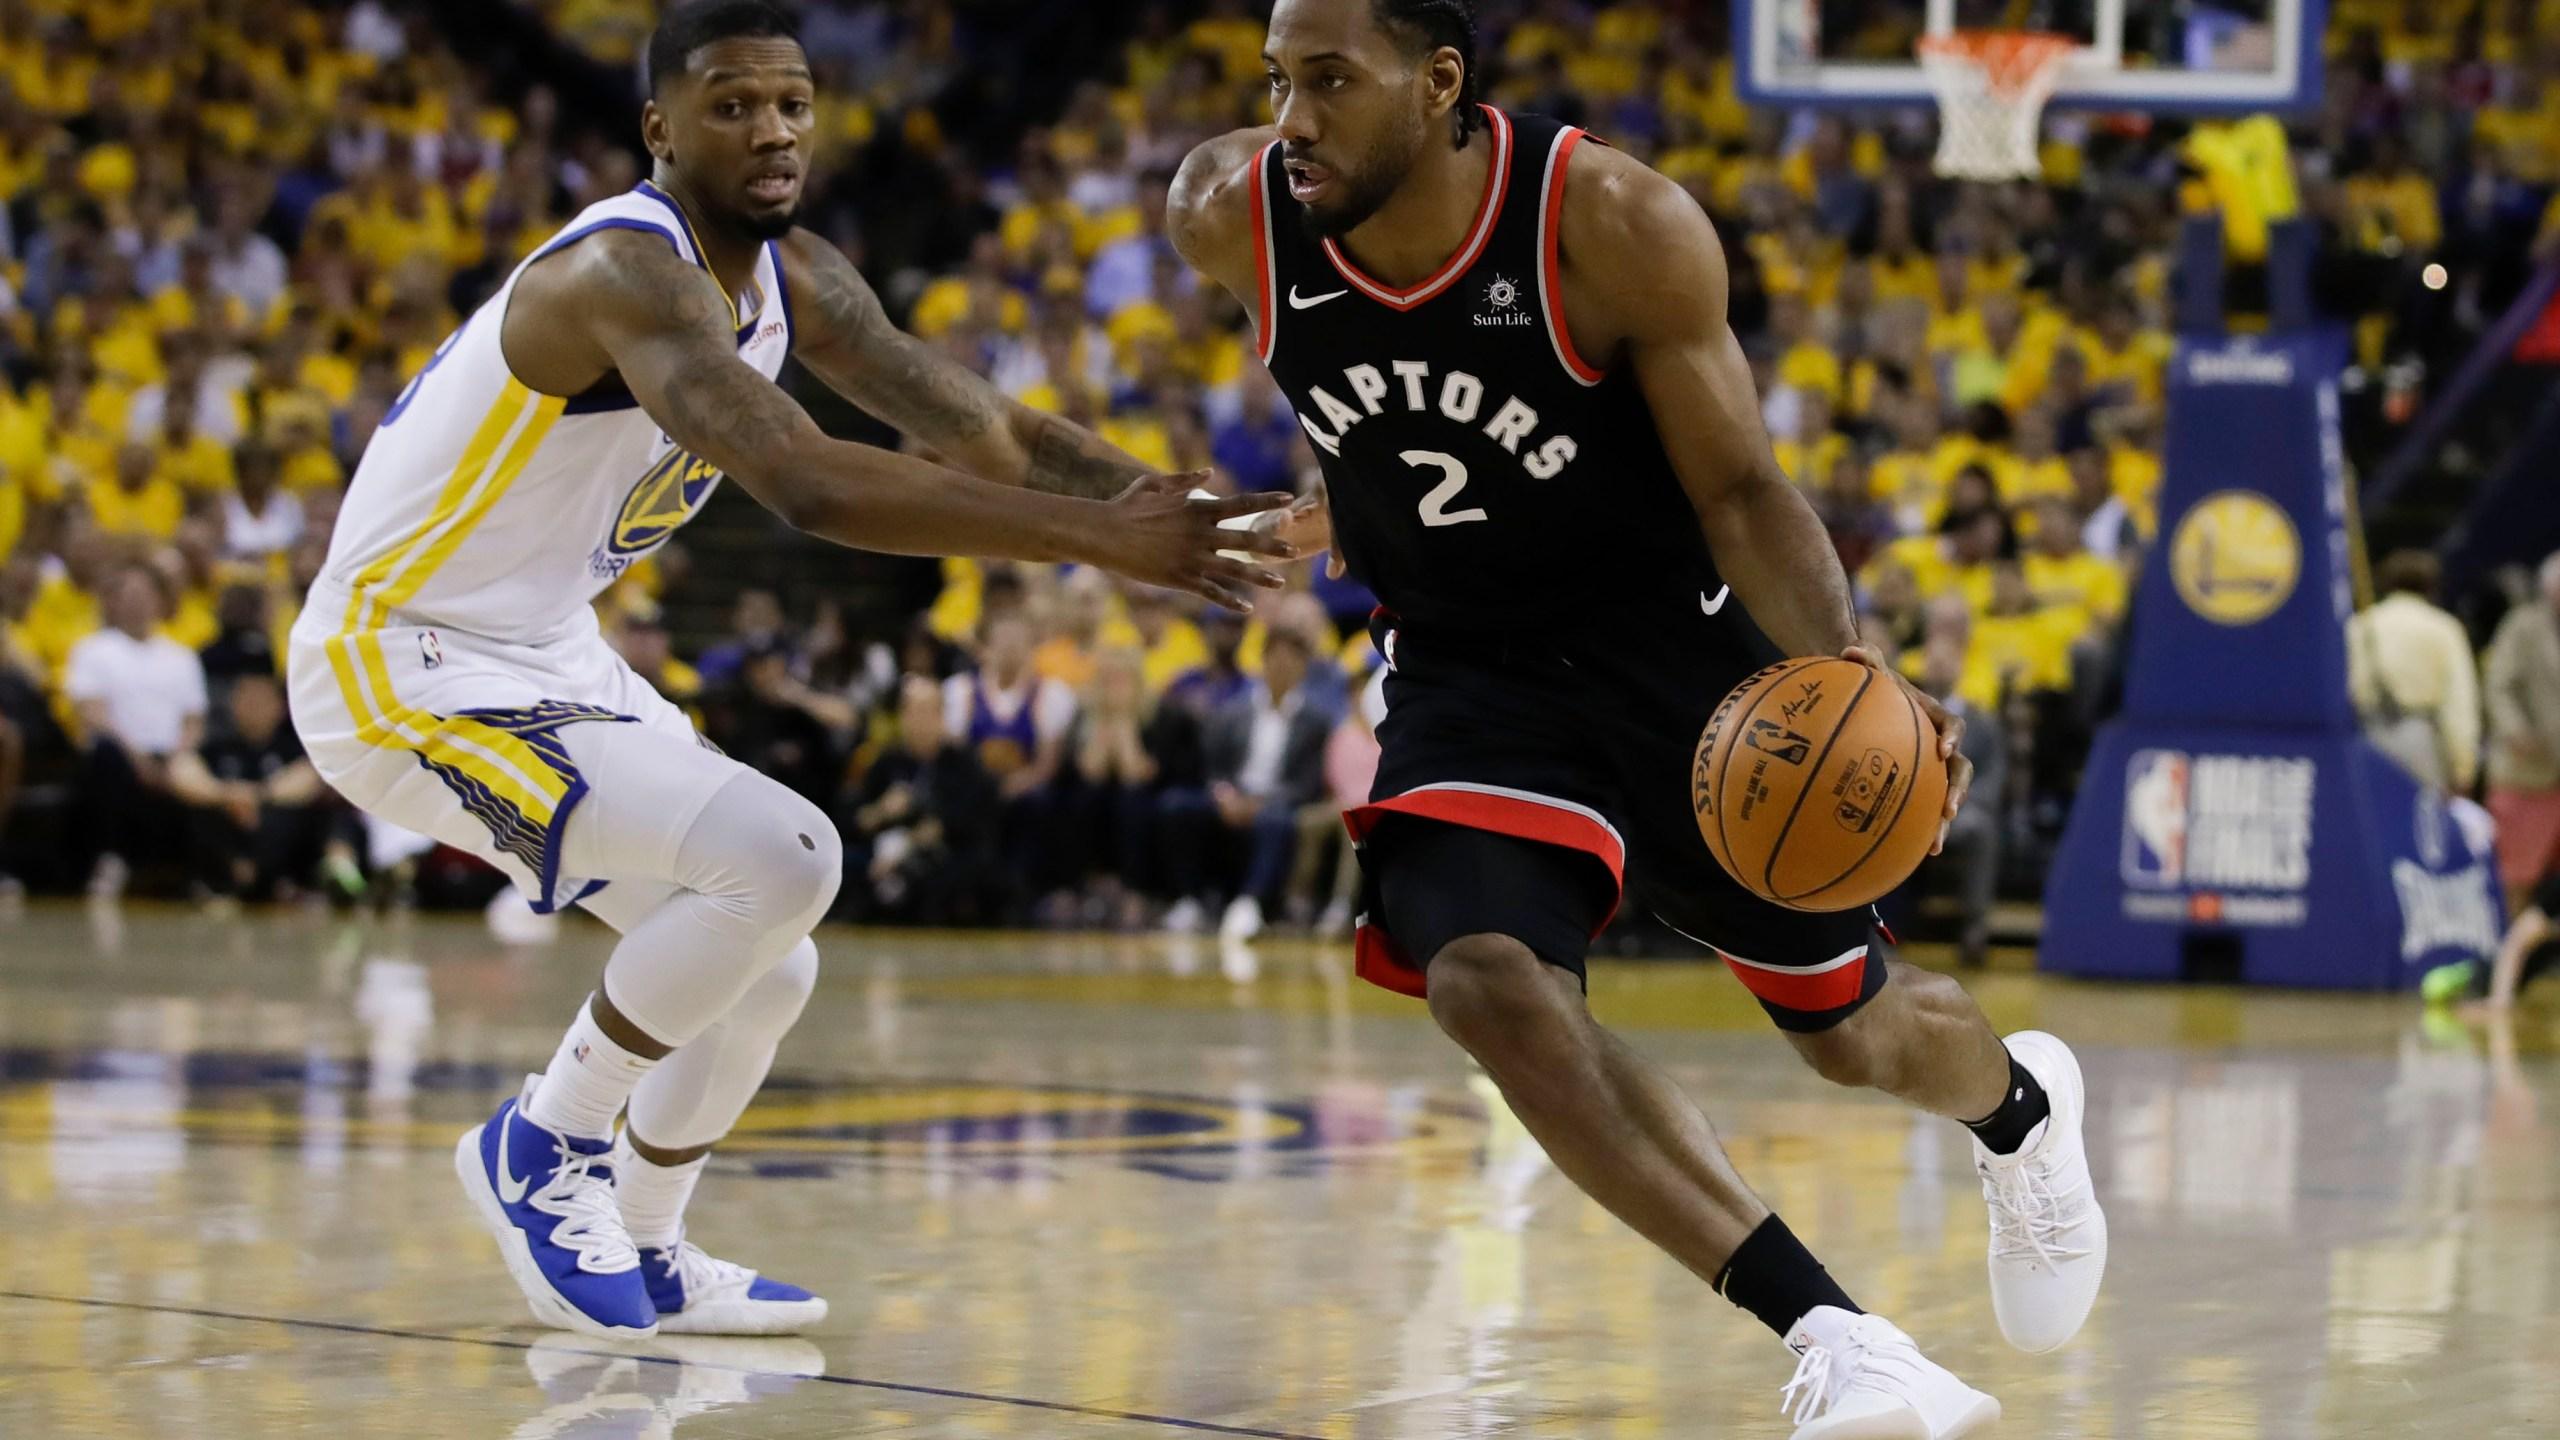 NBA_Finals_Raptors_Warriors_Basketball_82285-159532.jpg71922424